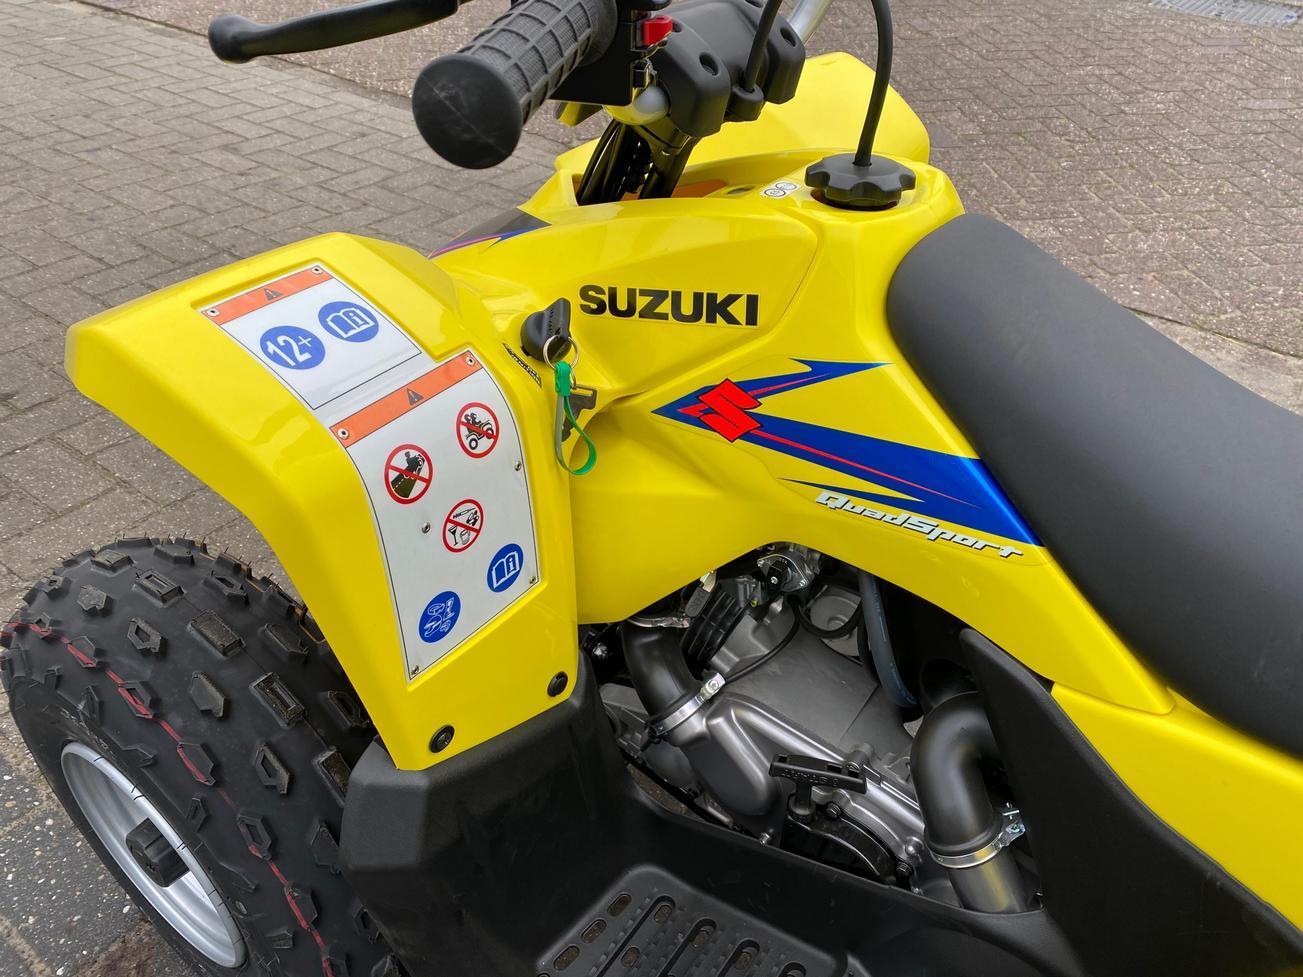 SUZUKI - LT-Z90 Quadsport